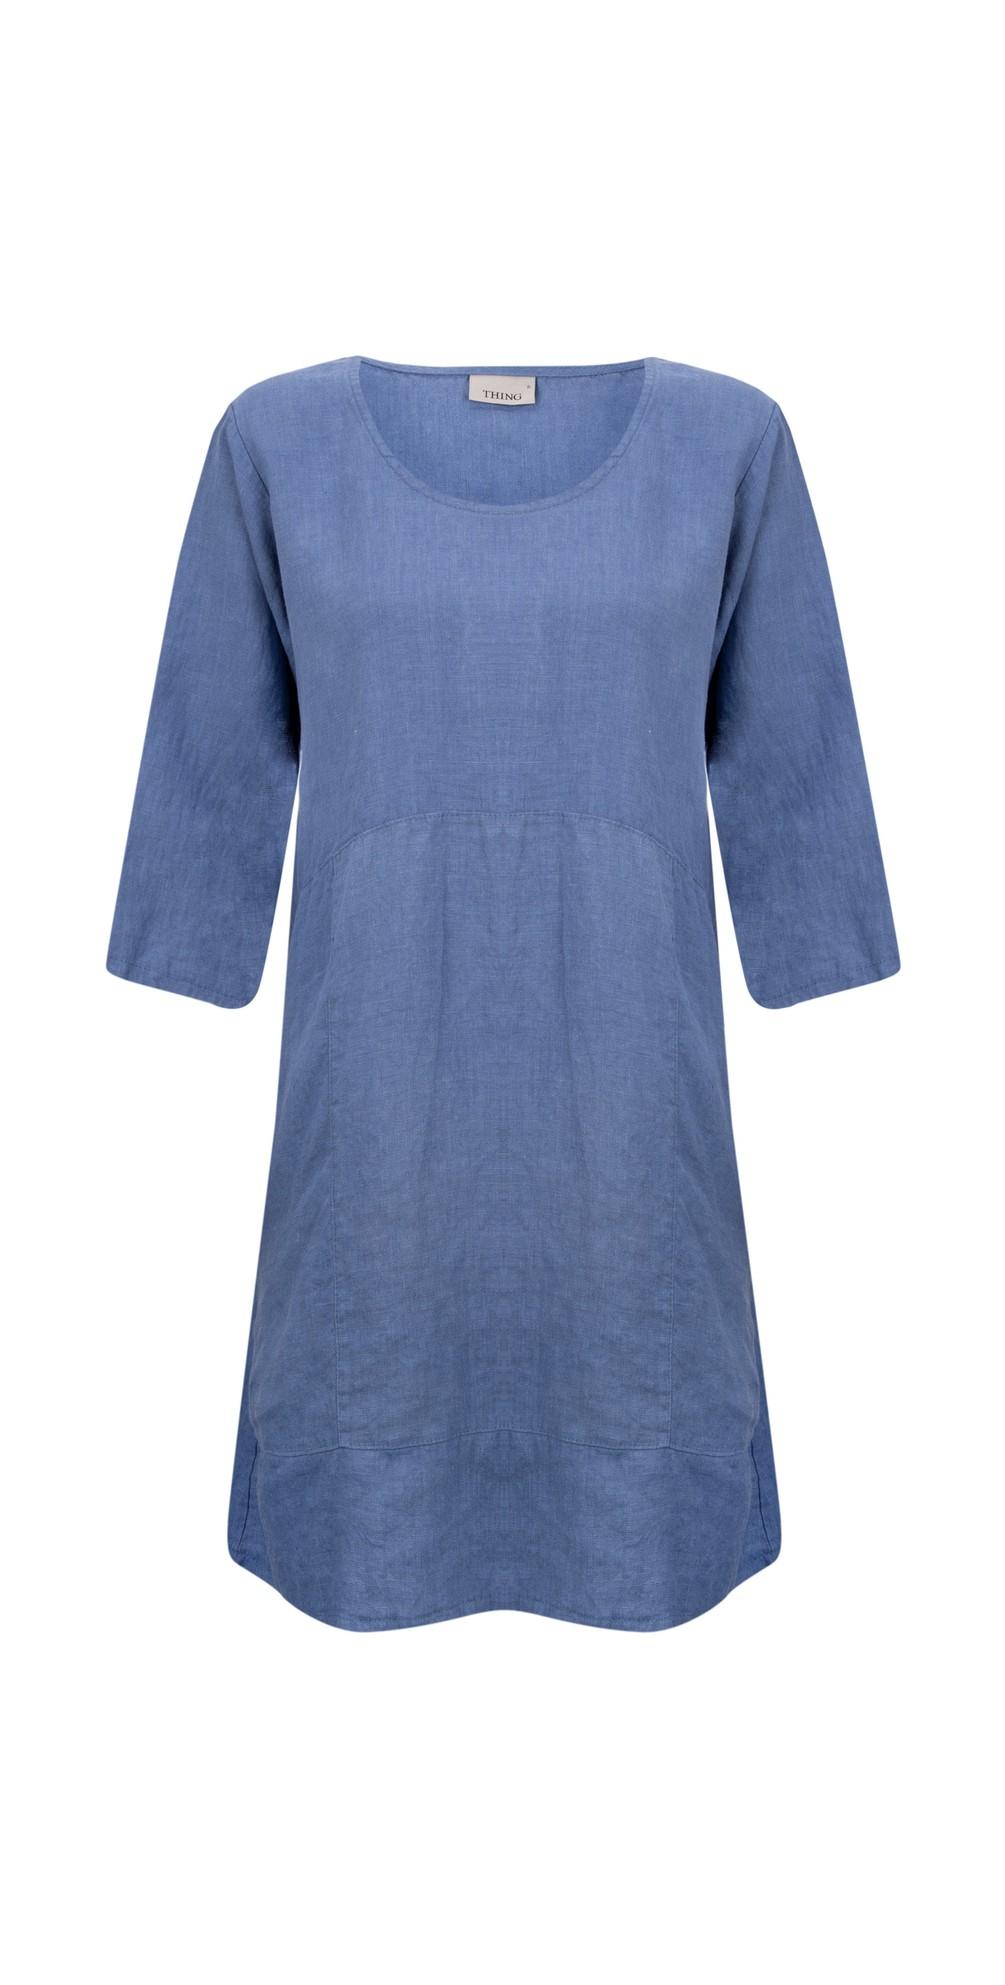 Mira Seamed Linen Tunic main image